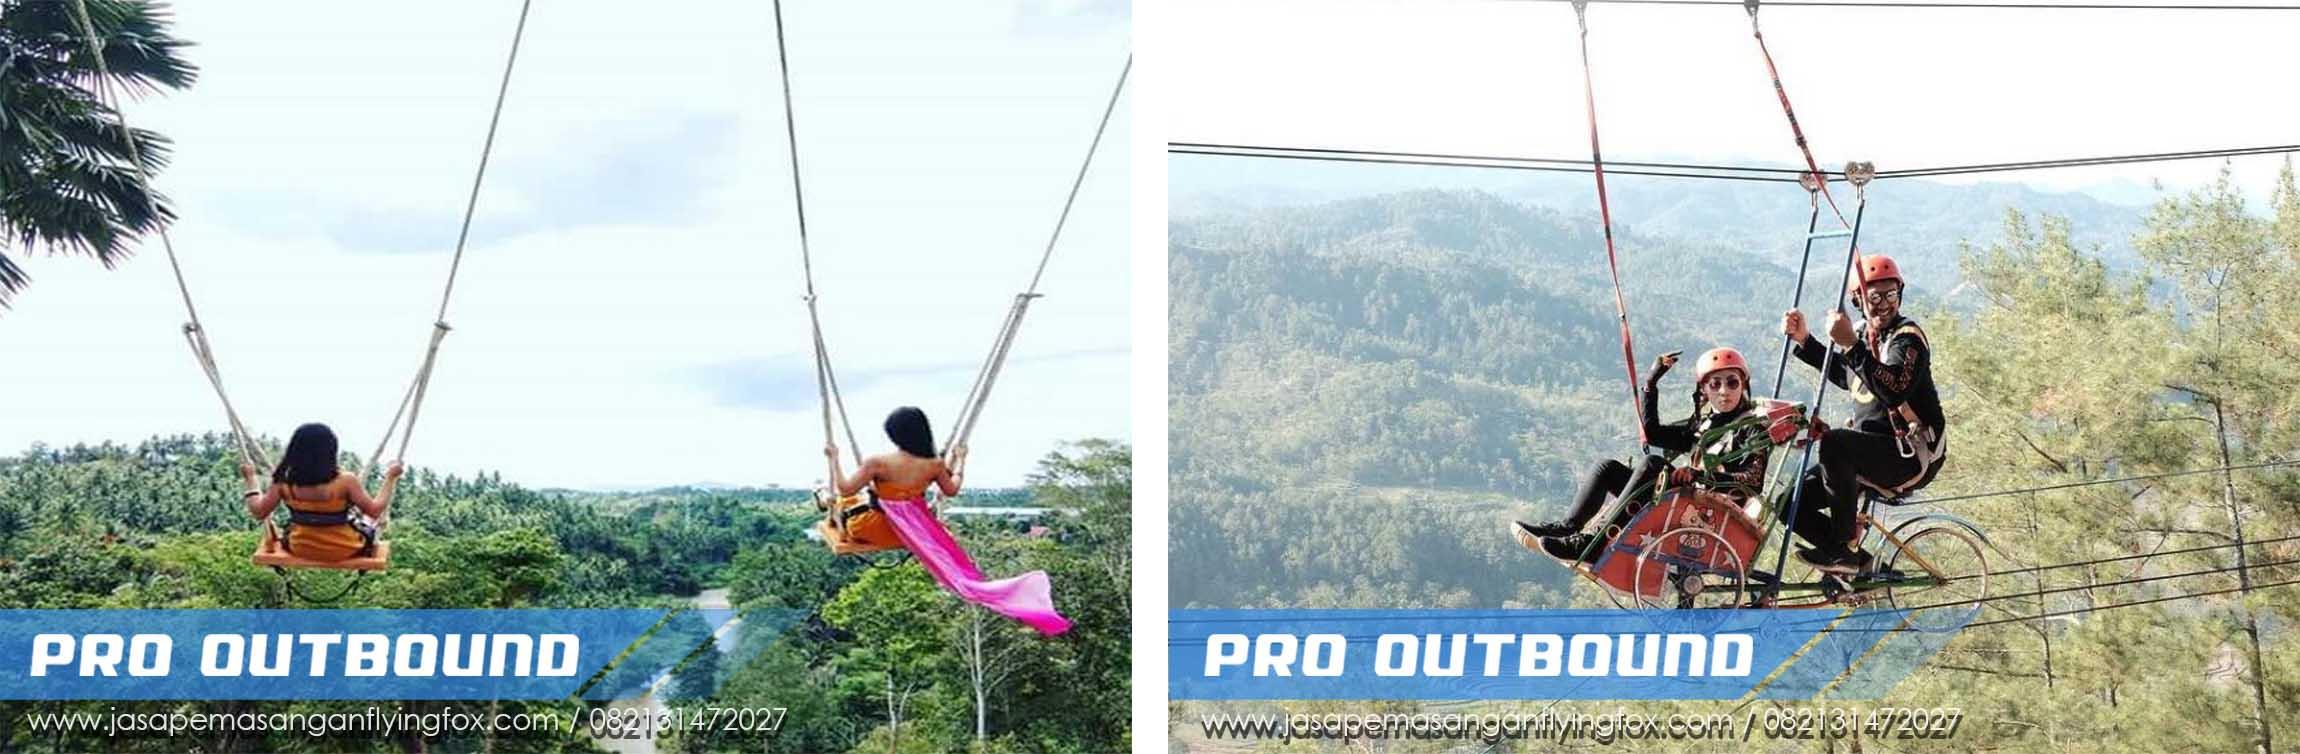 4 Wahana Outbound yang Wajib Untuk di Coba, Flying Fox Outbound Jawa Timur - 082131472027 (2)